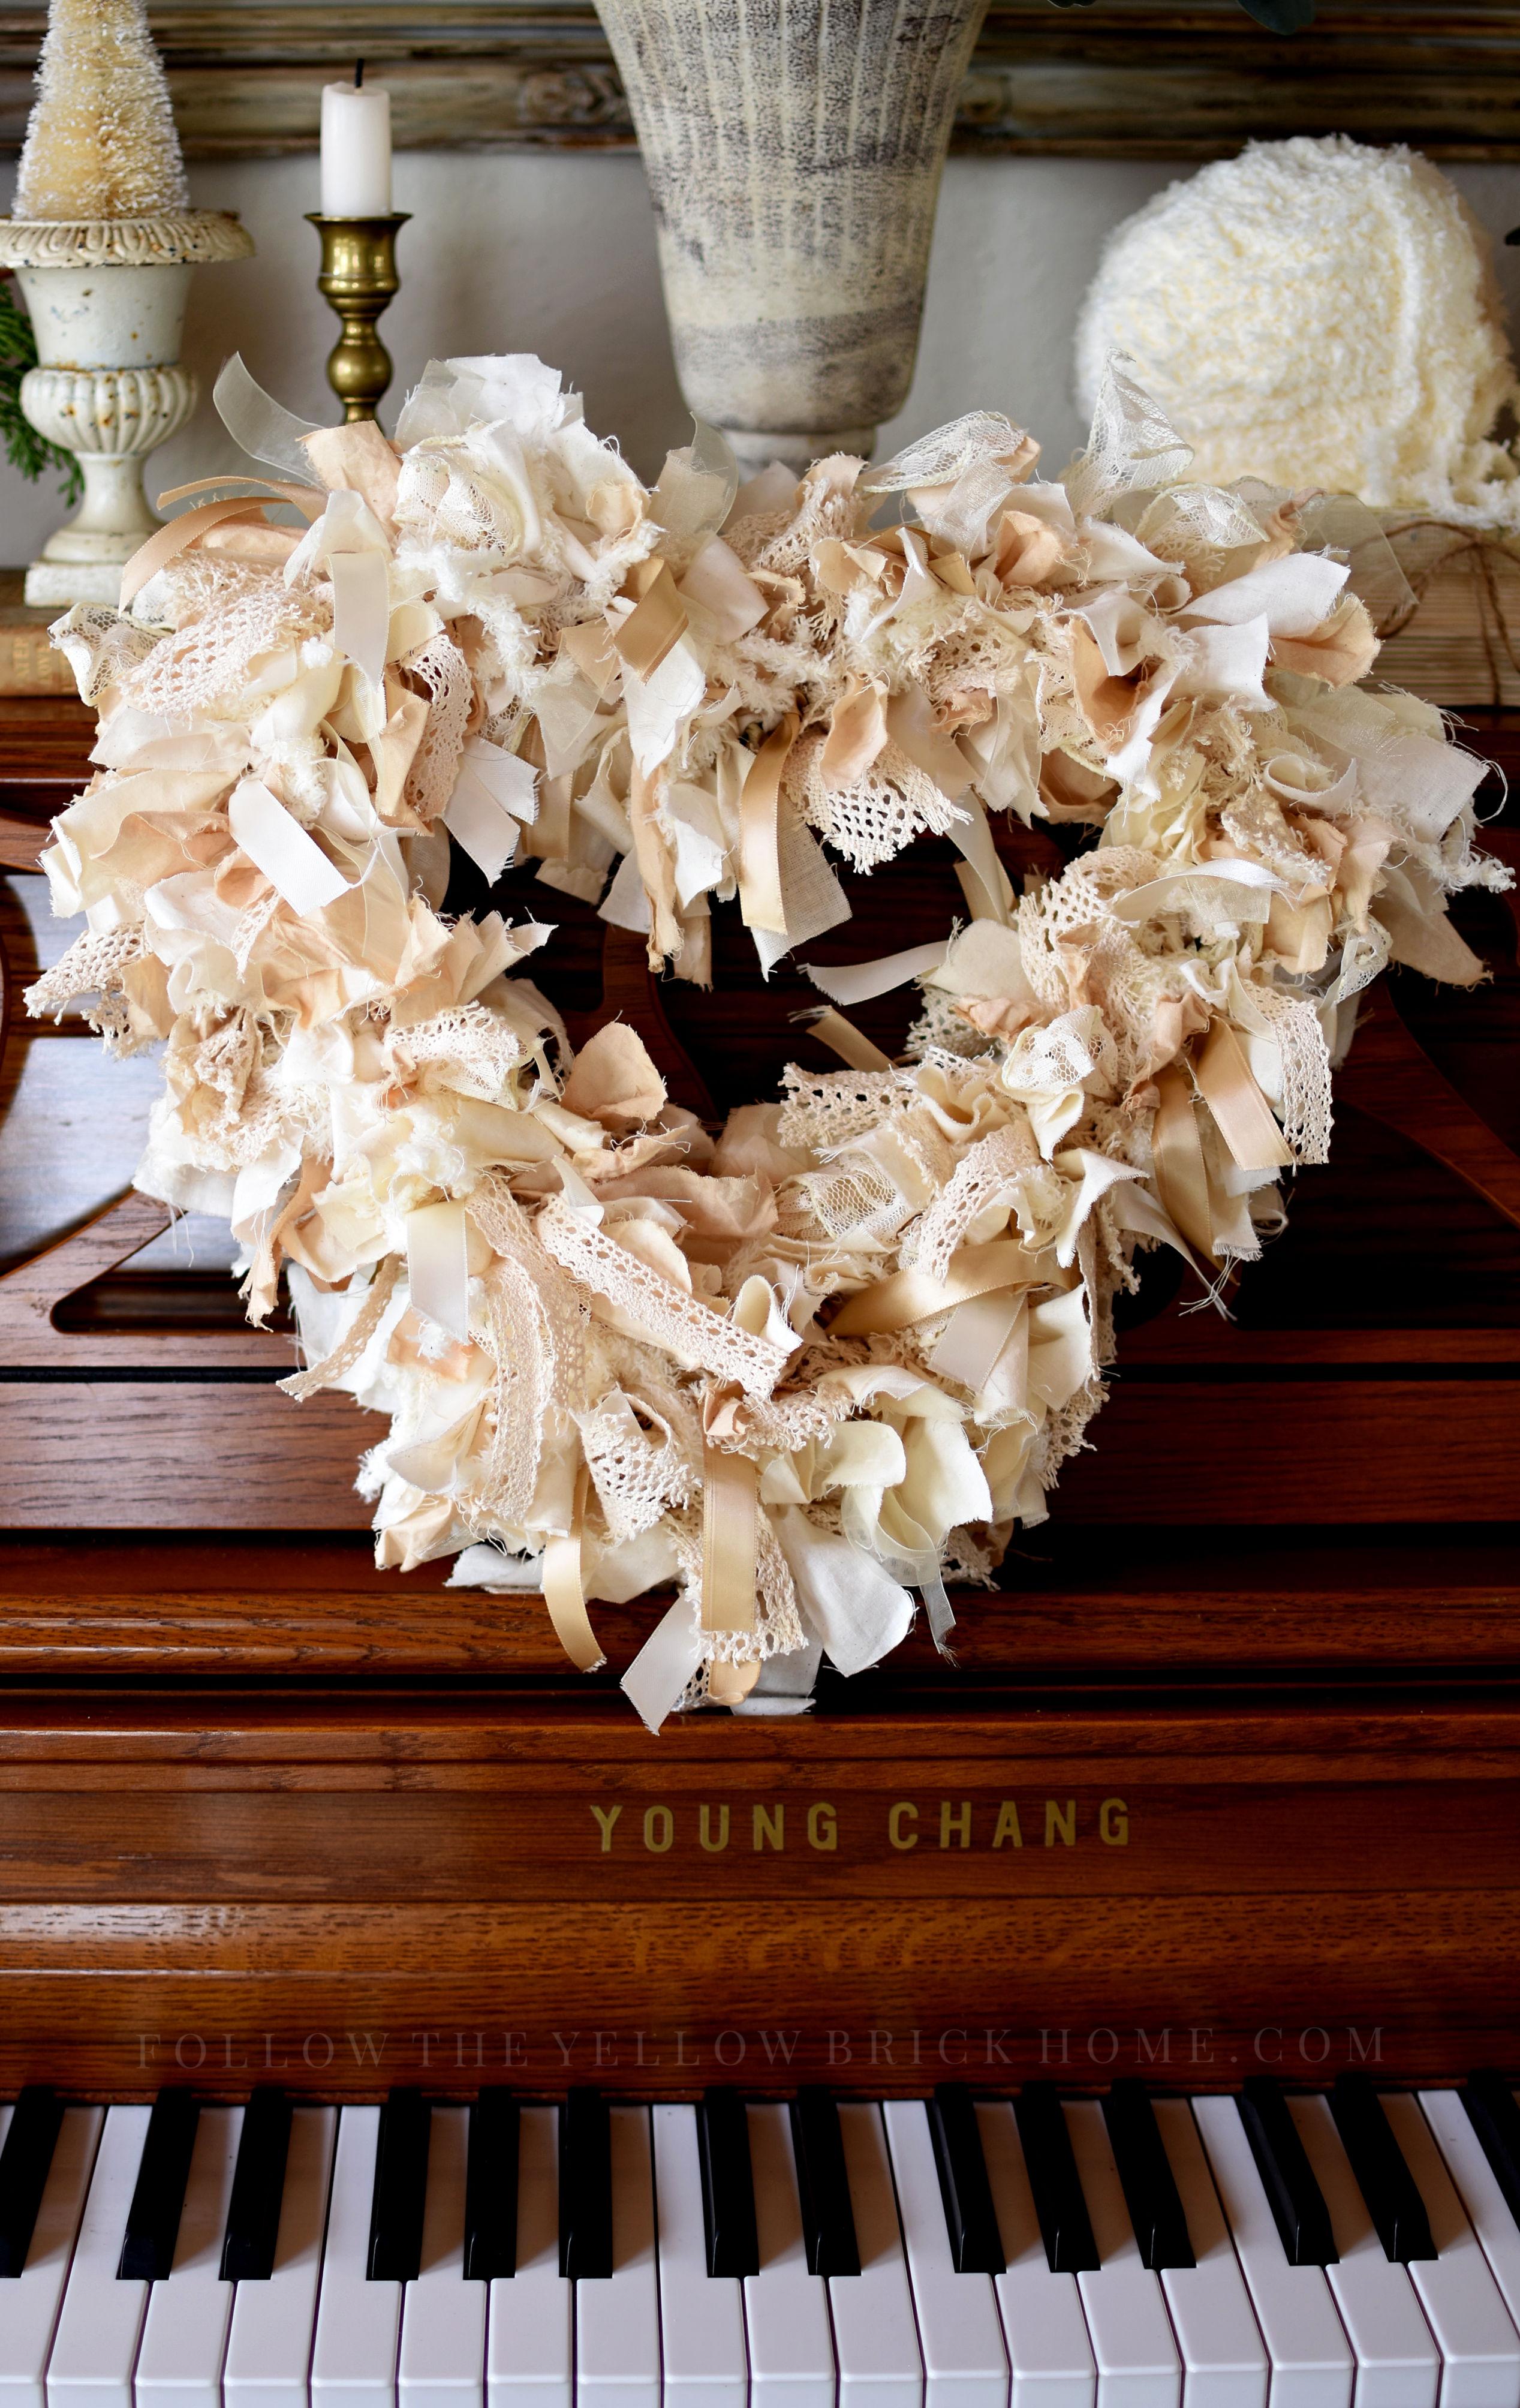 Custom farmhouse heart rag wreath by Amber Lyon Ferguson of Follow The Yellow Brick Home blog